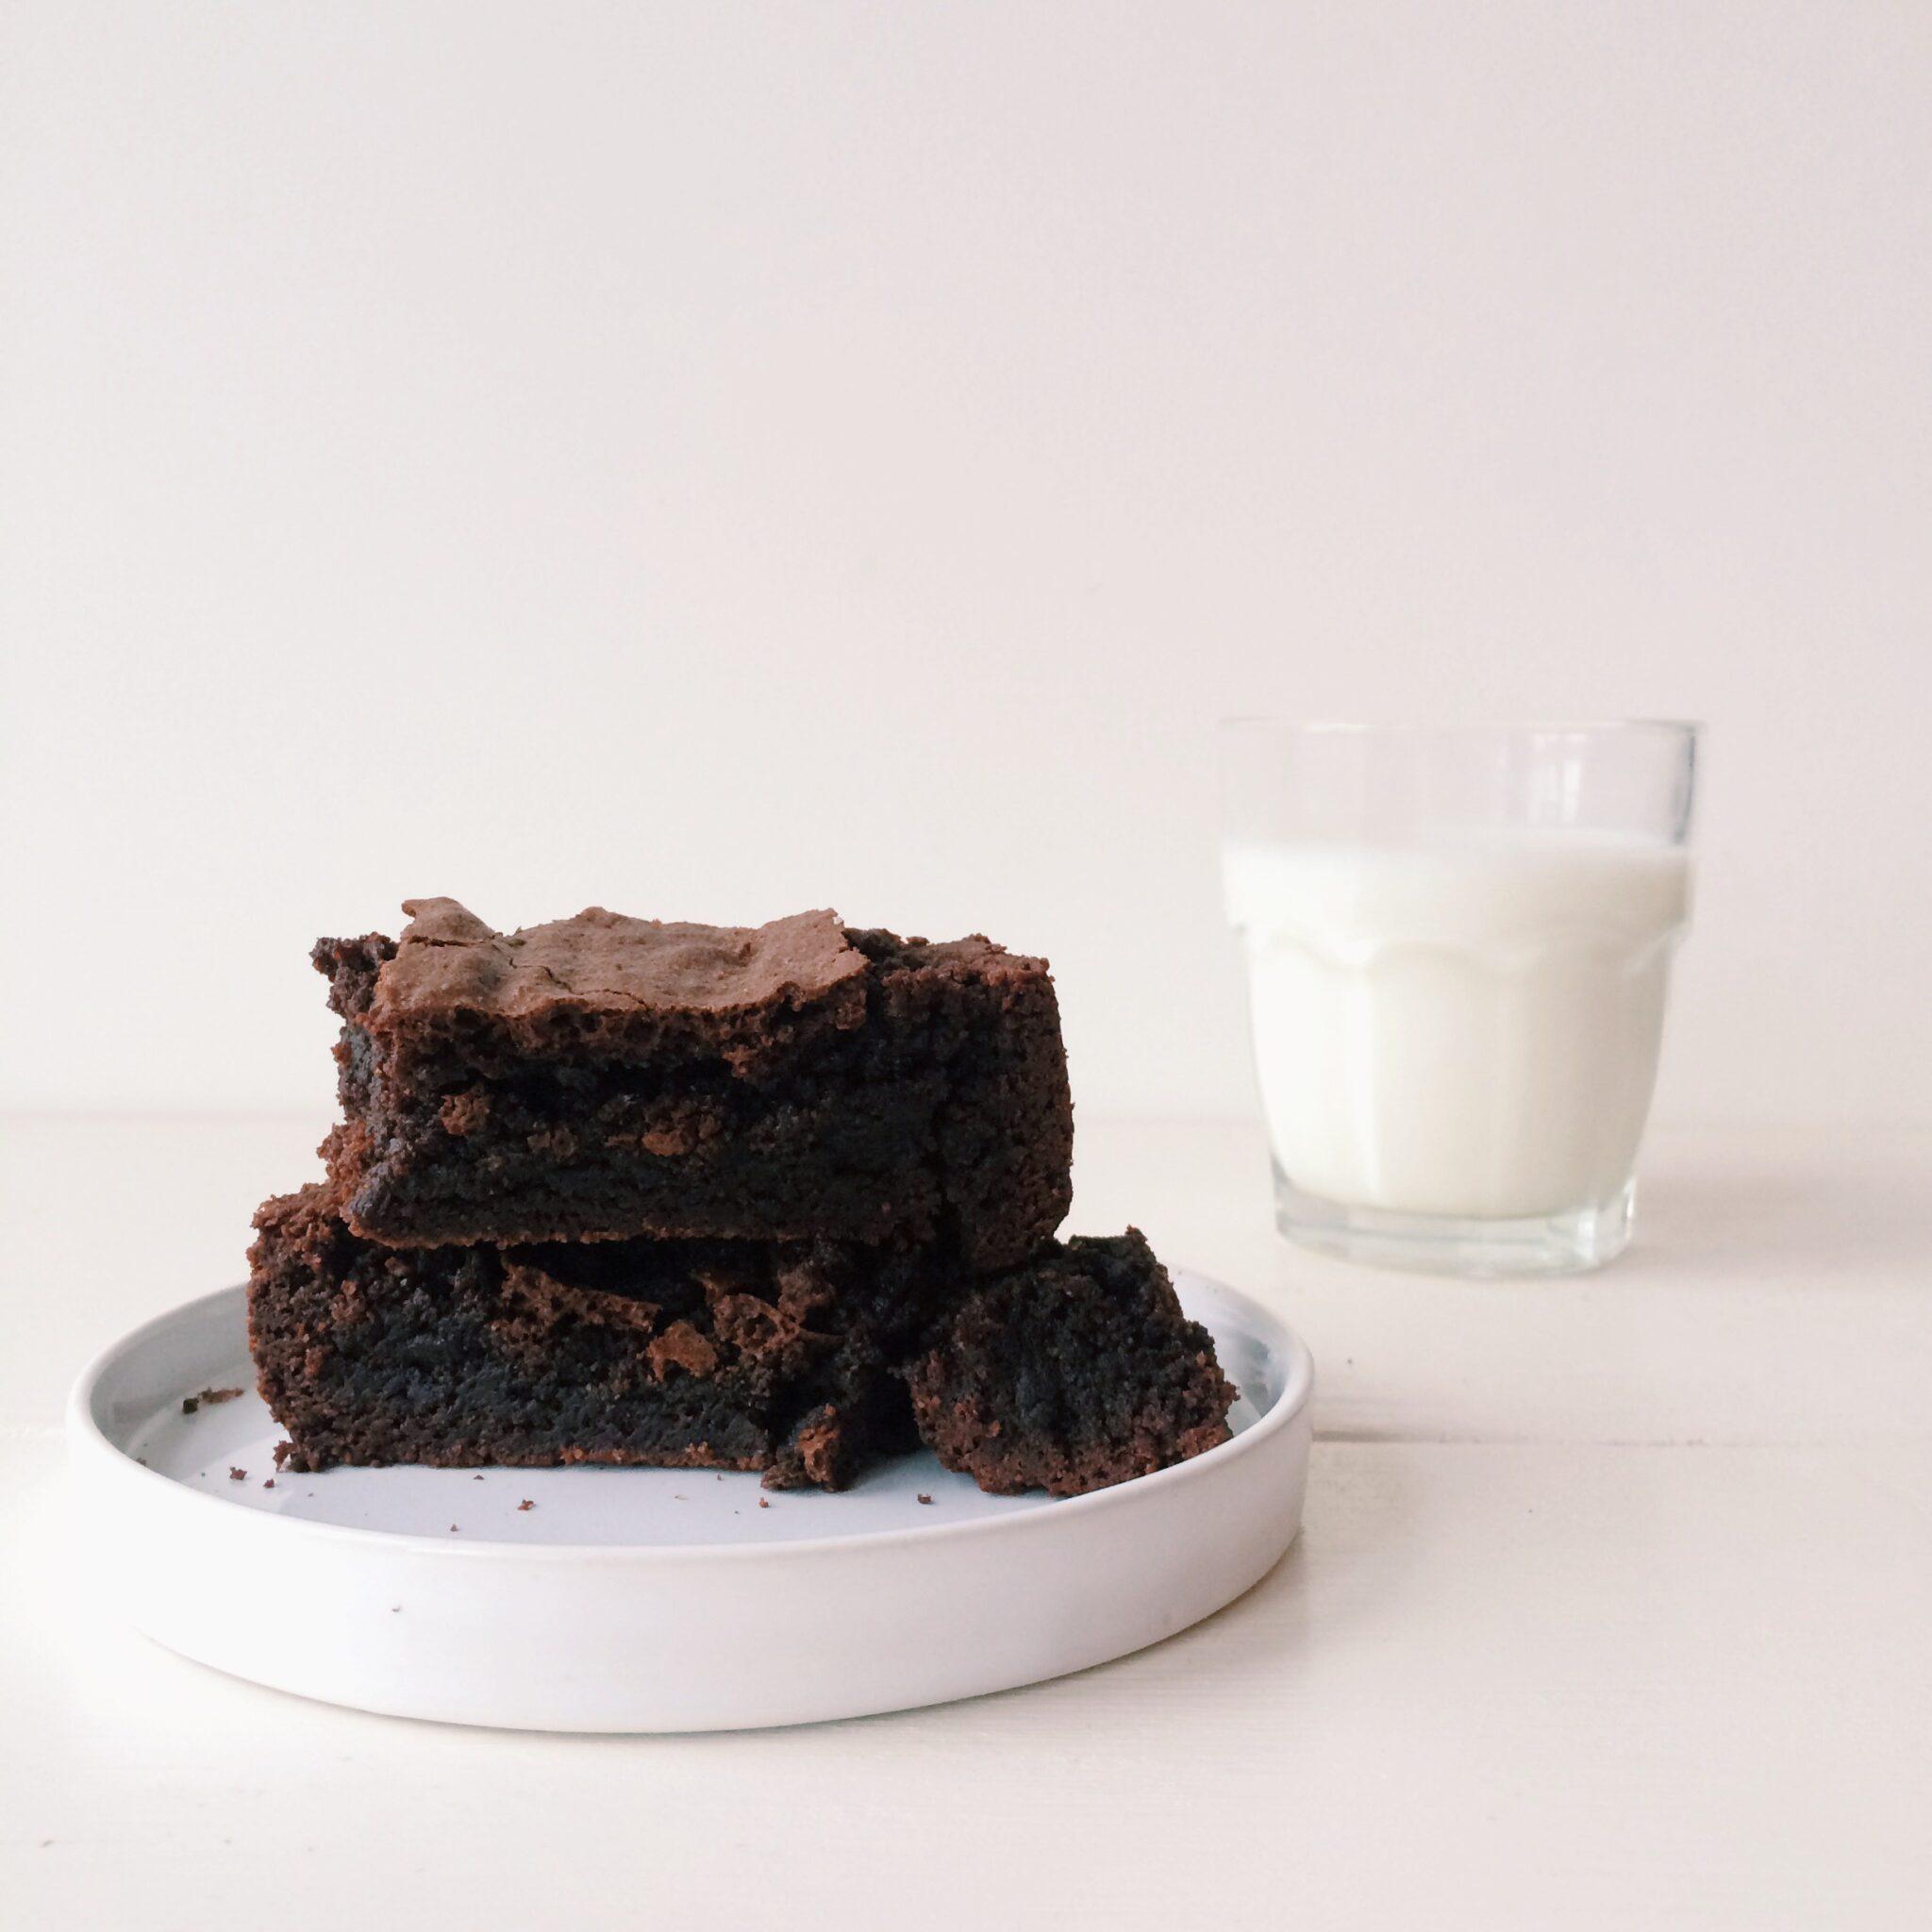 IMG 6451 e1412604078144 - Amarula chocolate brownie